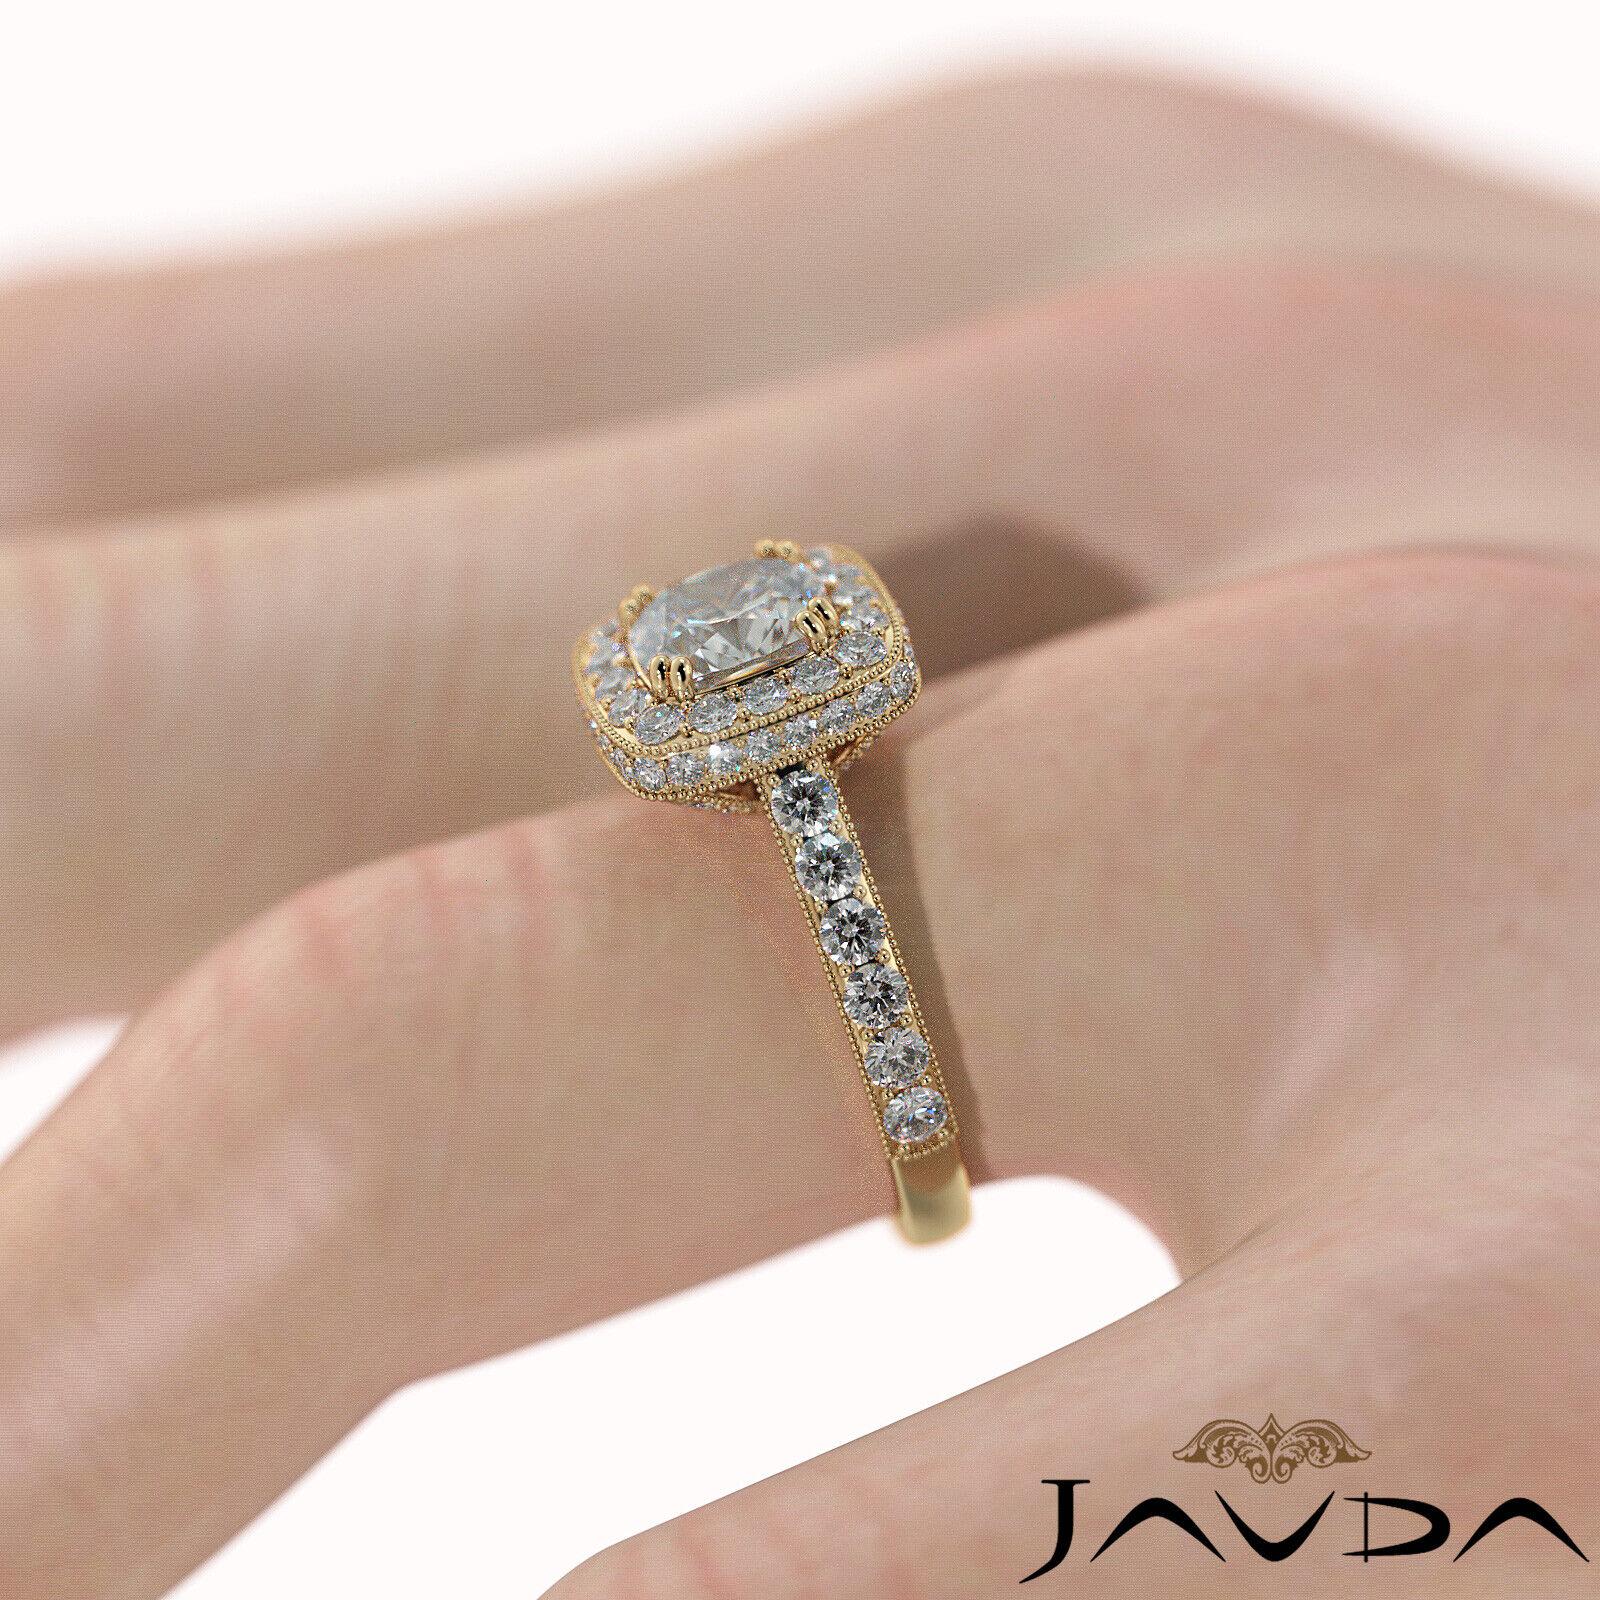 2ctw Milgrain Halo Floral Basket Cushion Diamond Engagement Ring GIA H-VS2 Gold 11